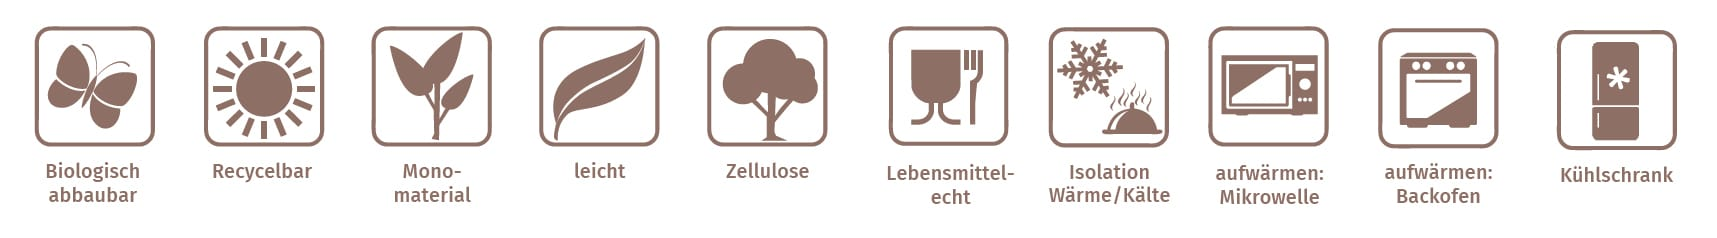 Messerle Icons Verpackungen